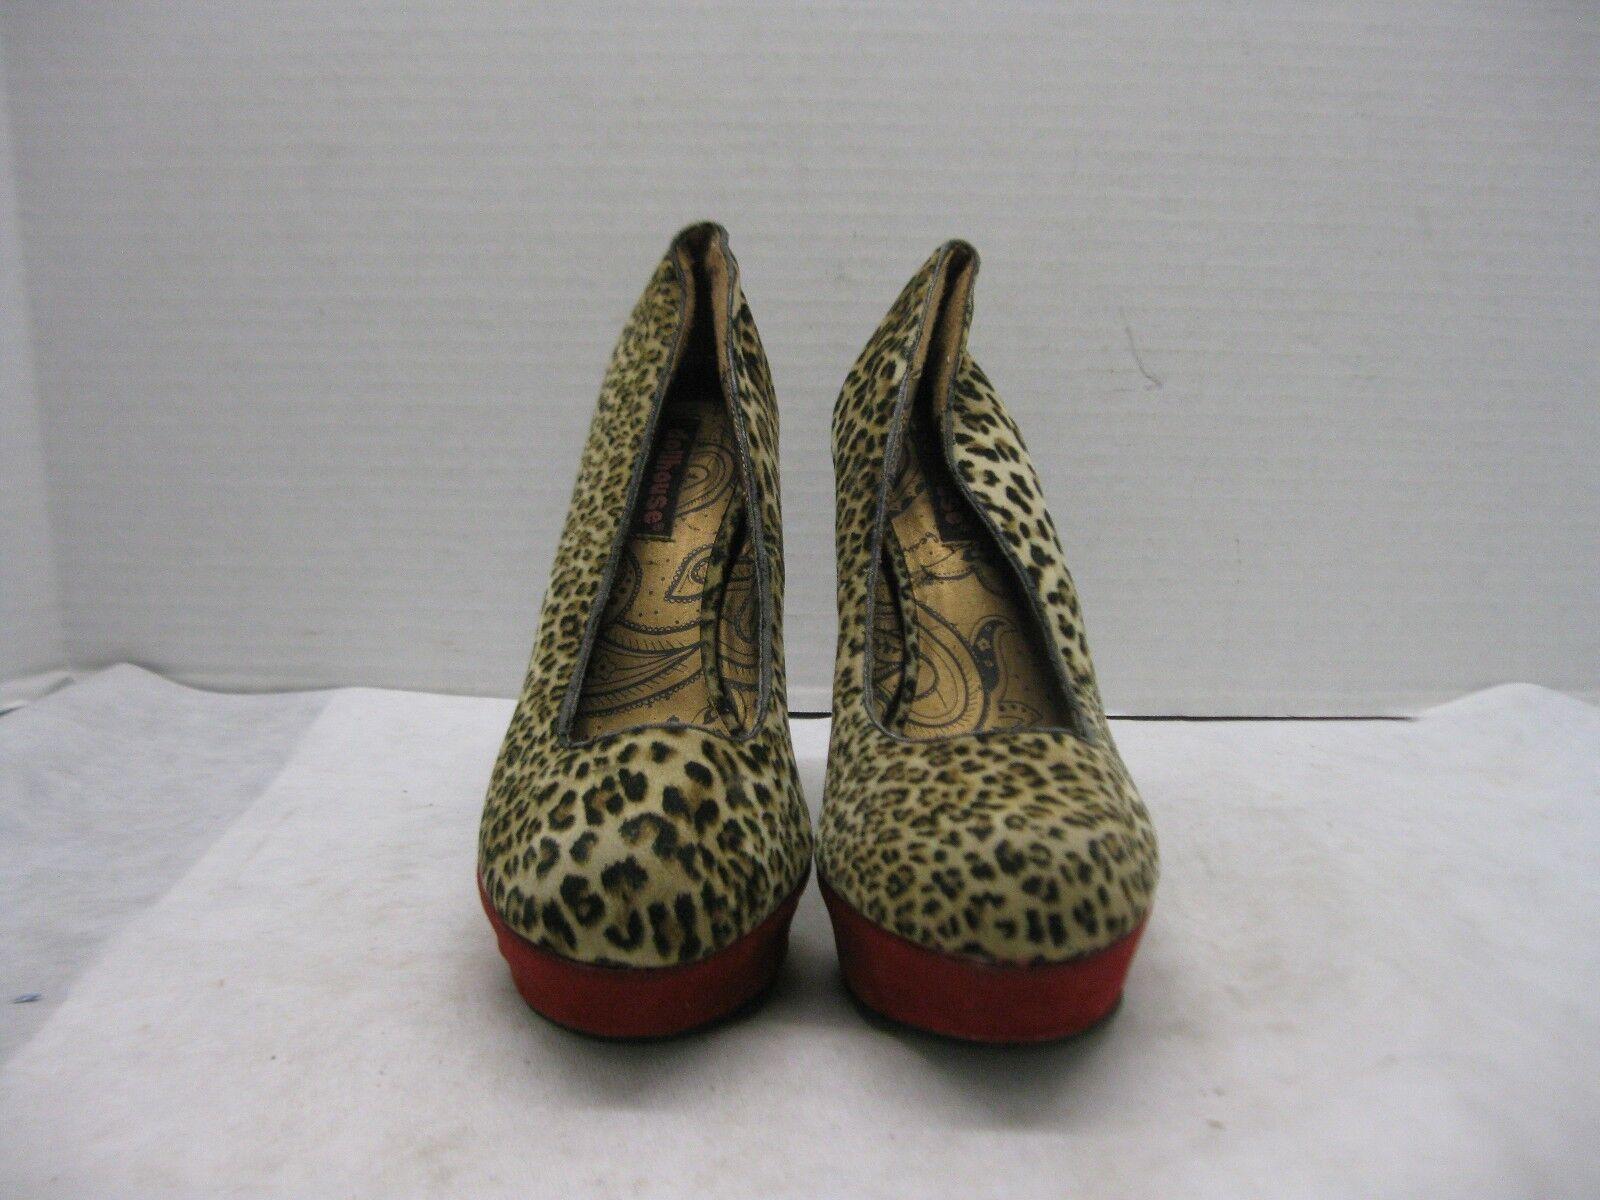 dollhouse dollhouse dollhouse femmes est imprimé léopard taille style talons haut talon aiguille 7,5 0a7f0a